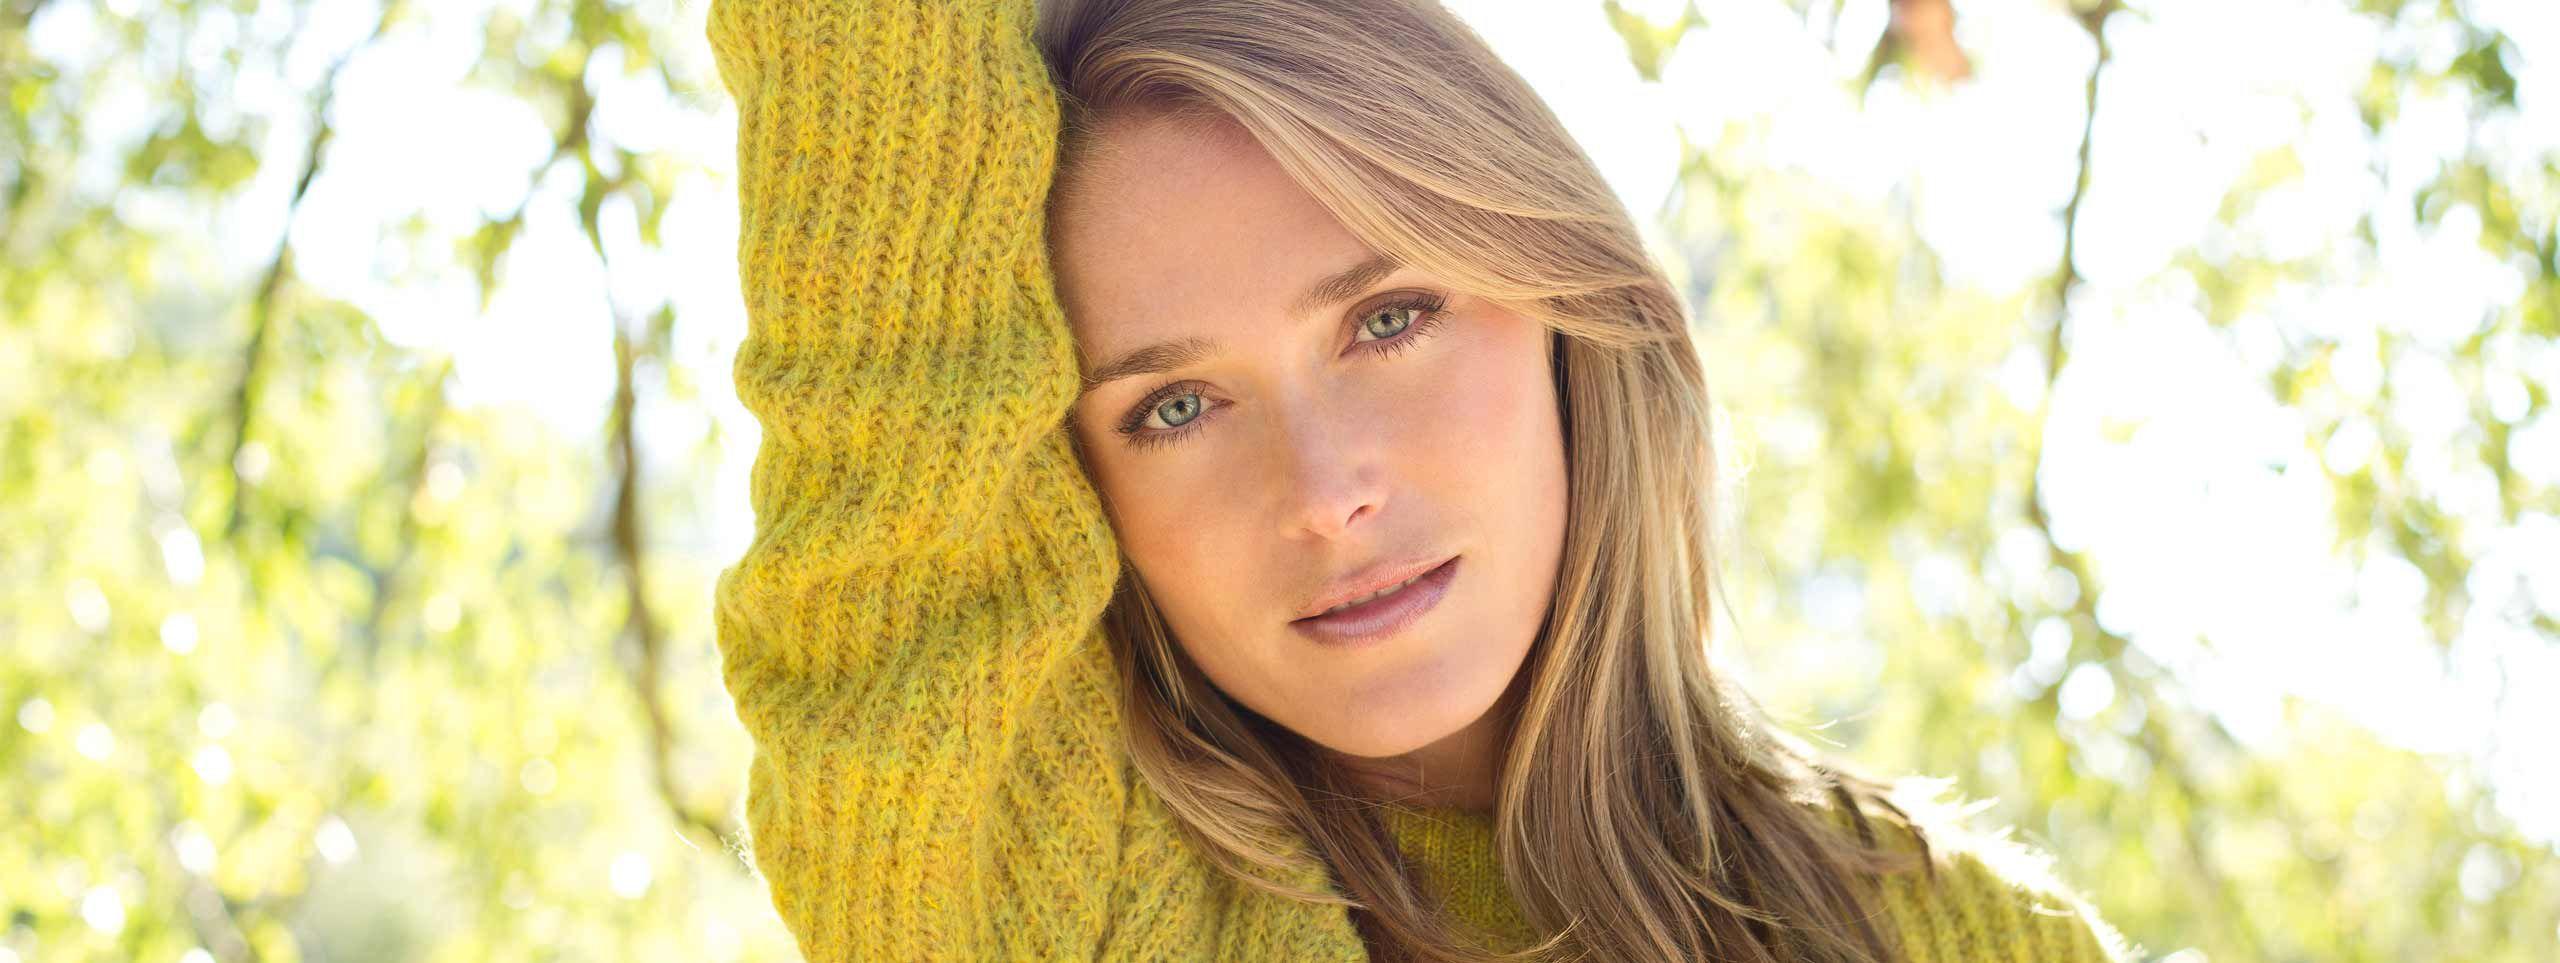 Žena sa žutim džemperom napolju